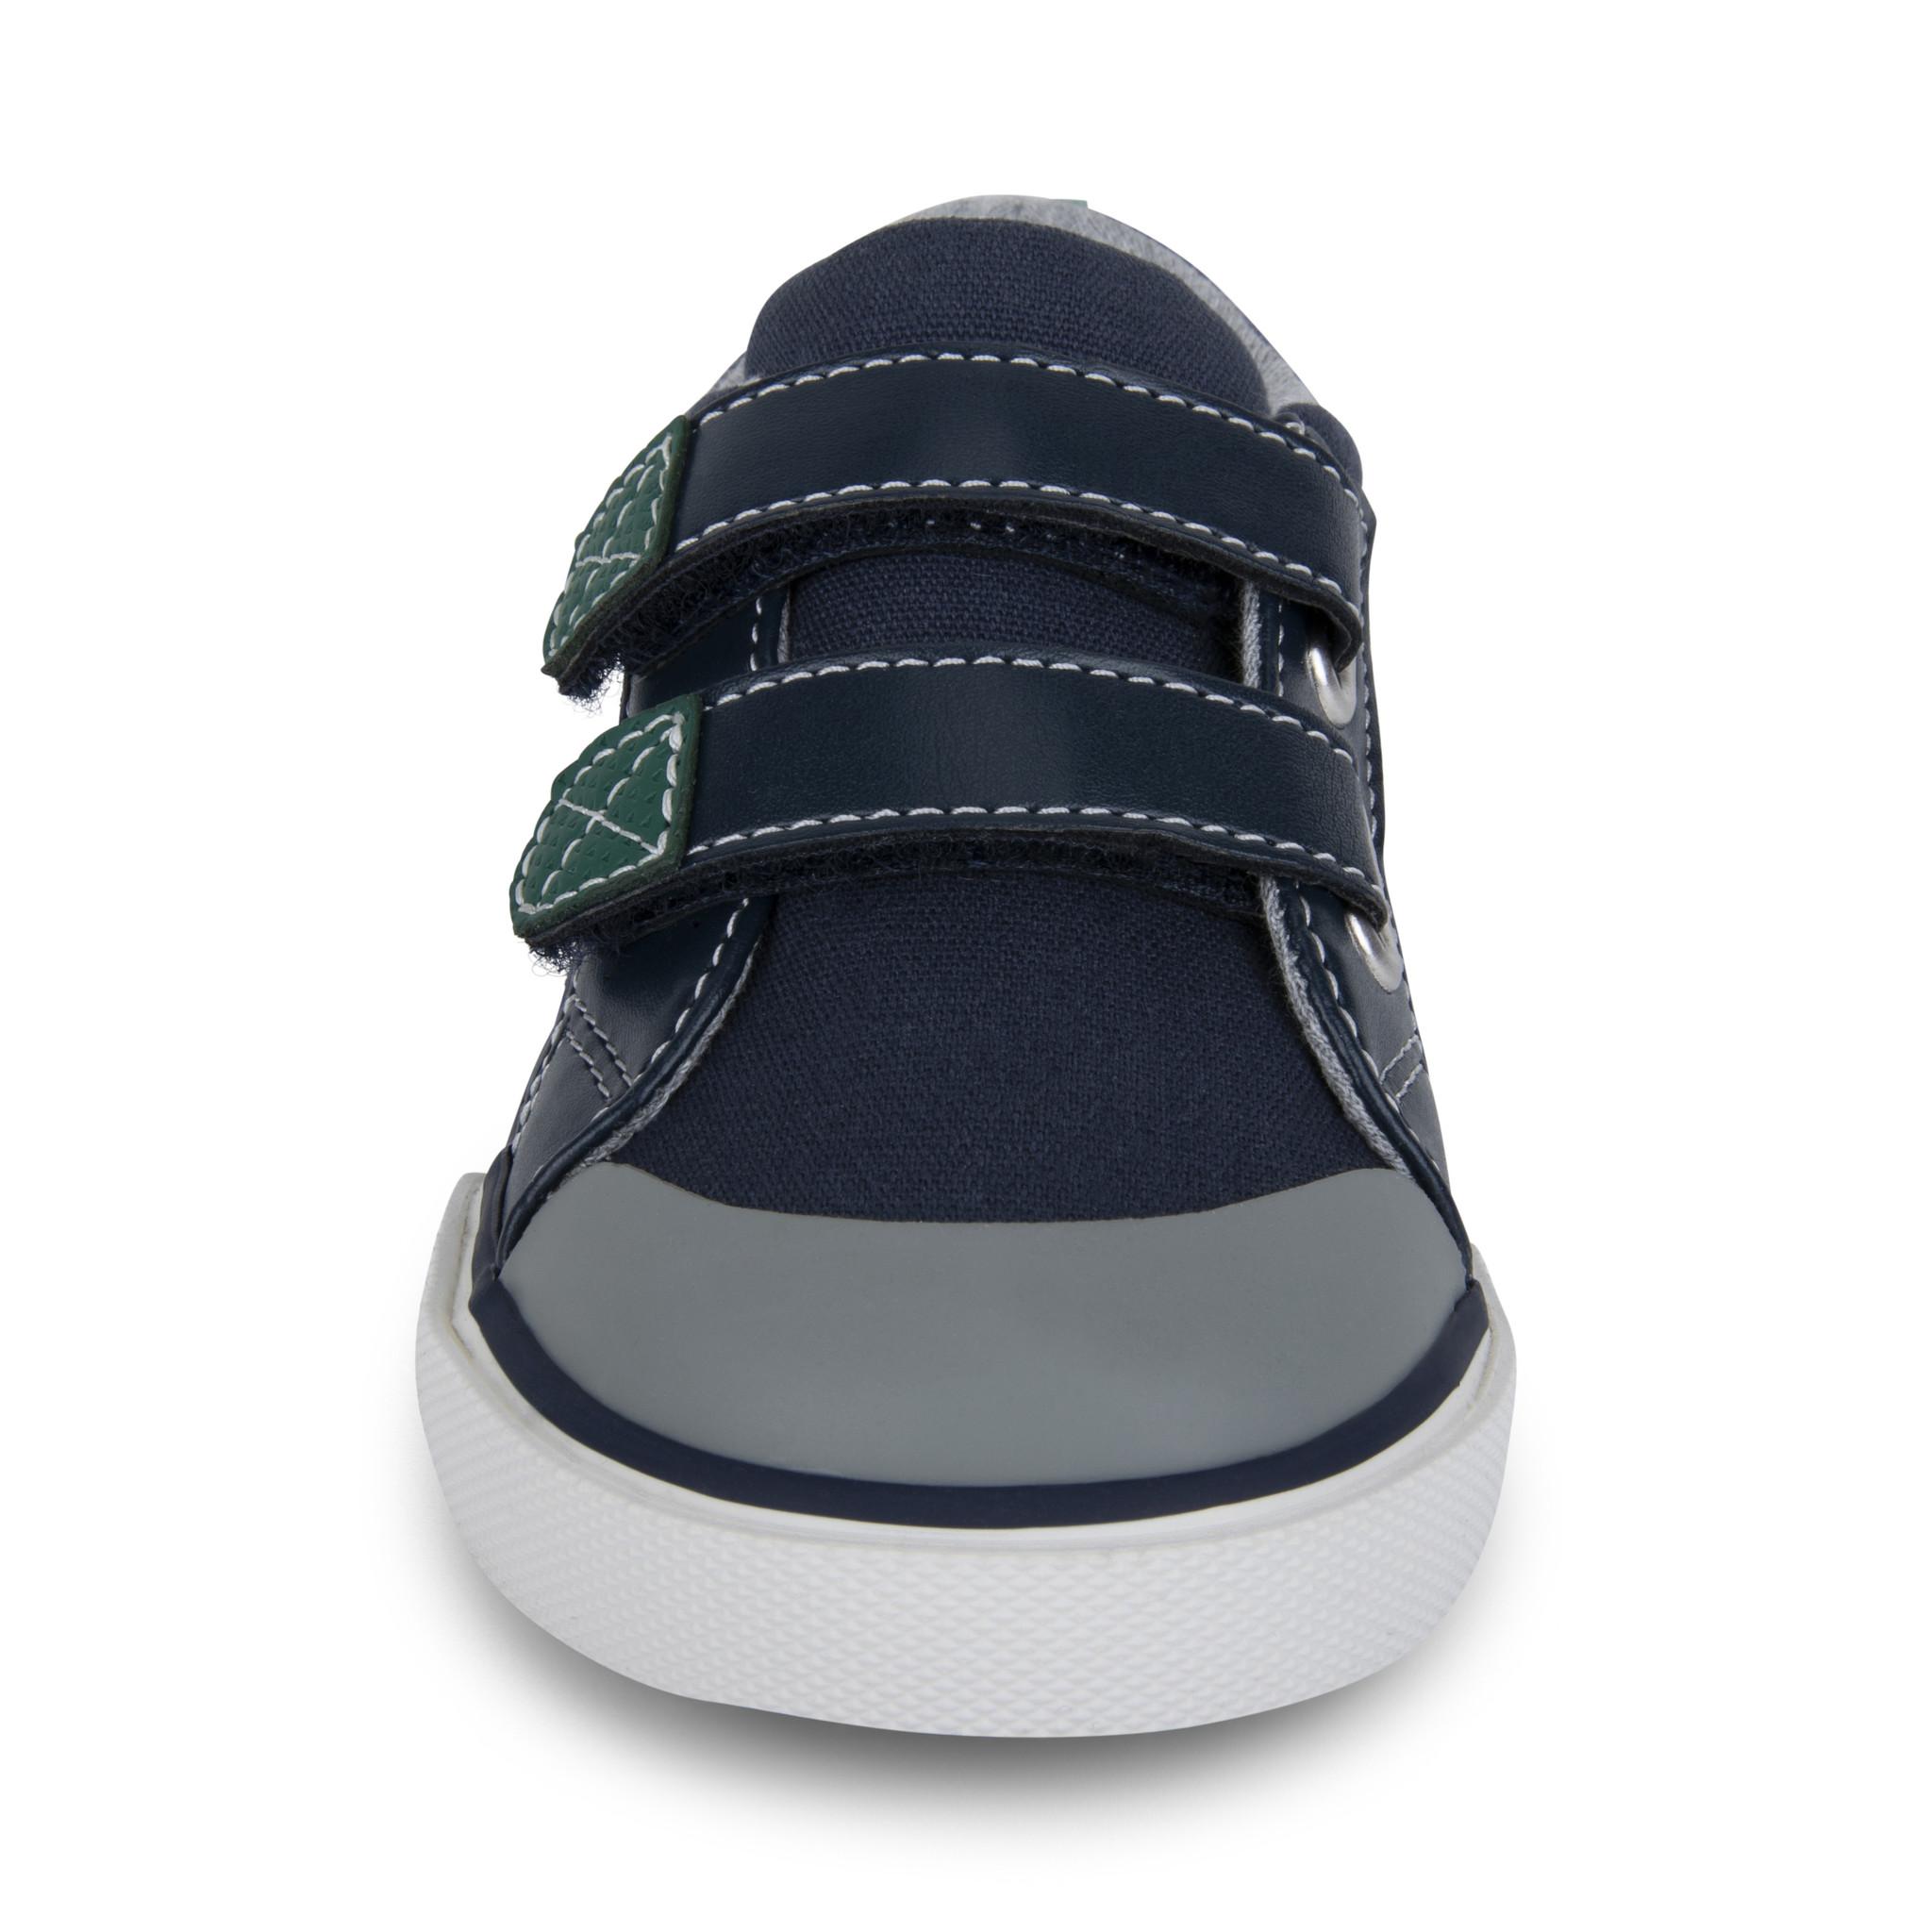 See Kai Run See Kai Run Russell Toddler Navy/Green